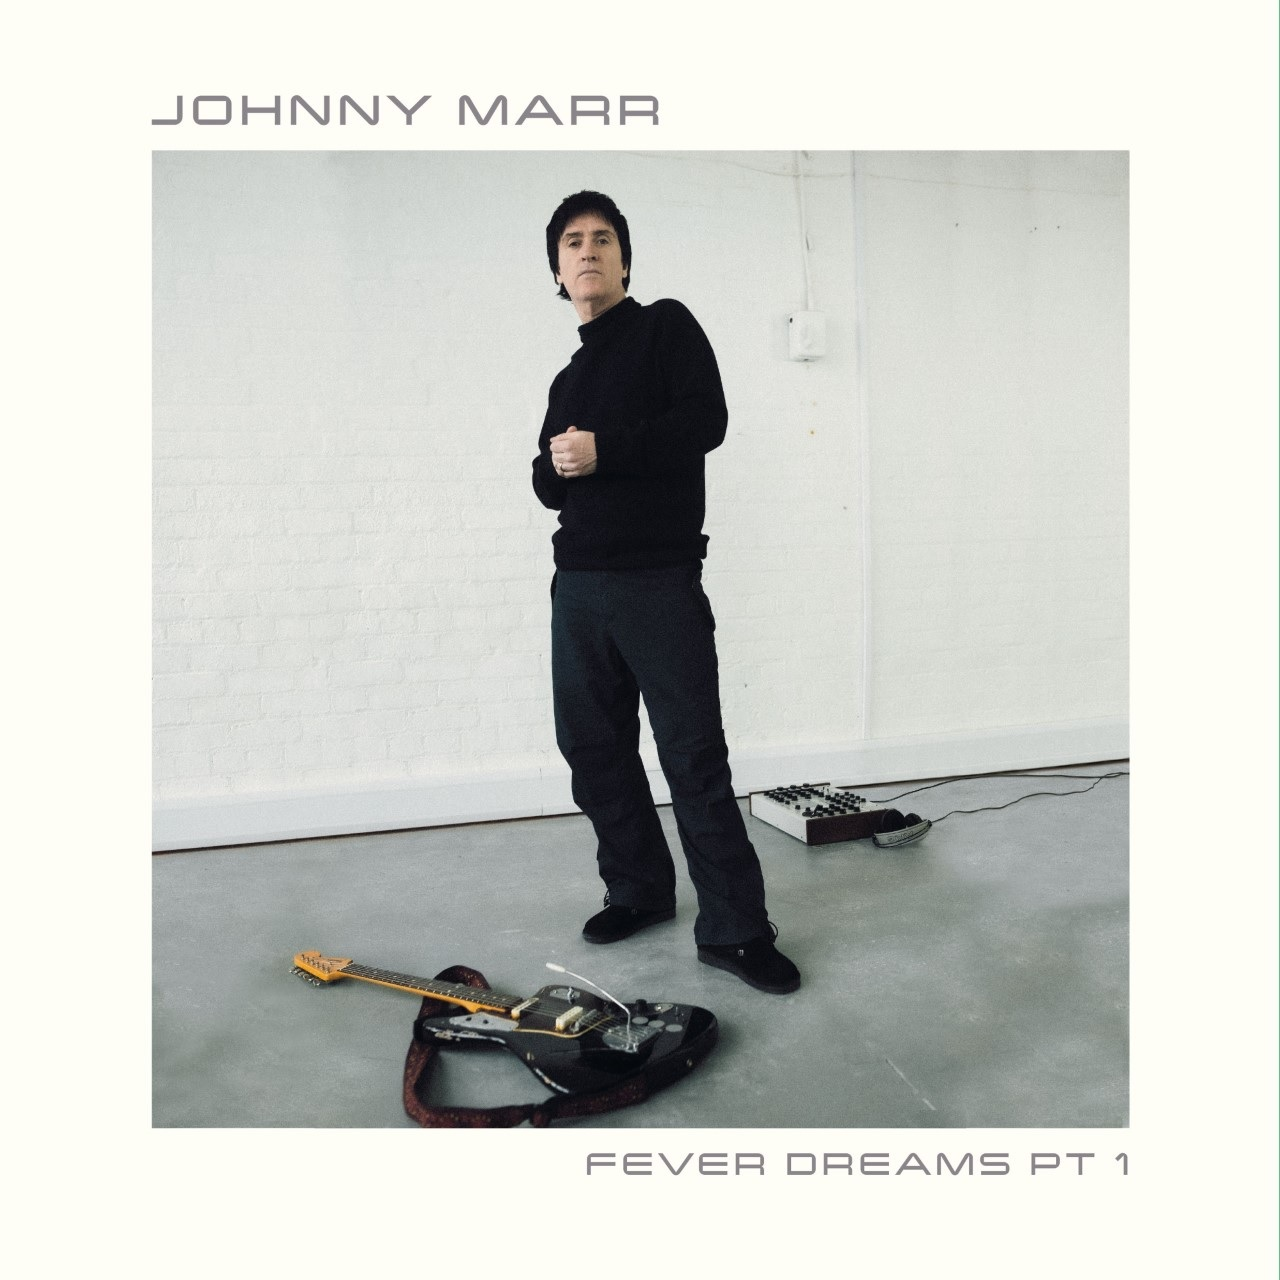 Johnny Marr - Fever Dreams Pt 1 EP